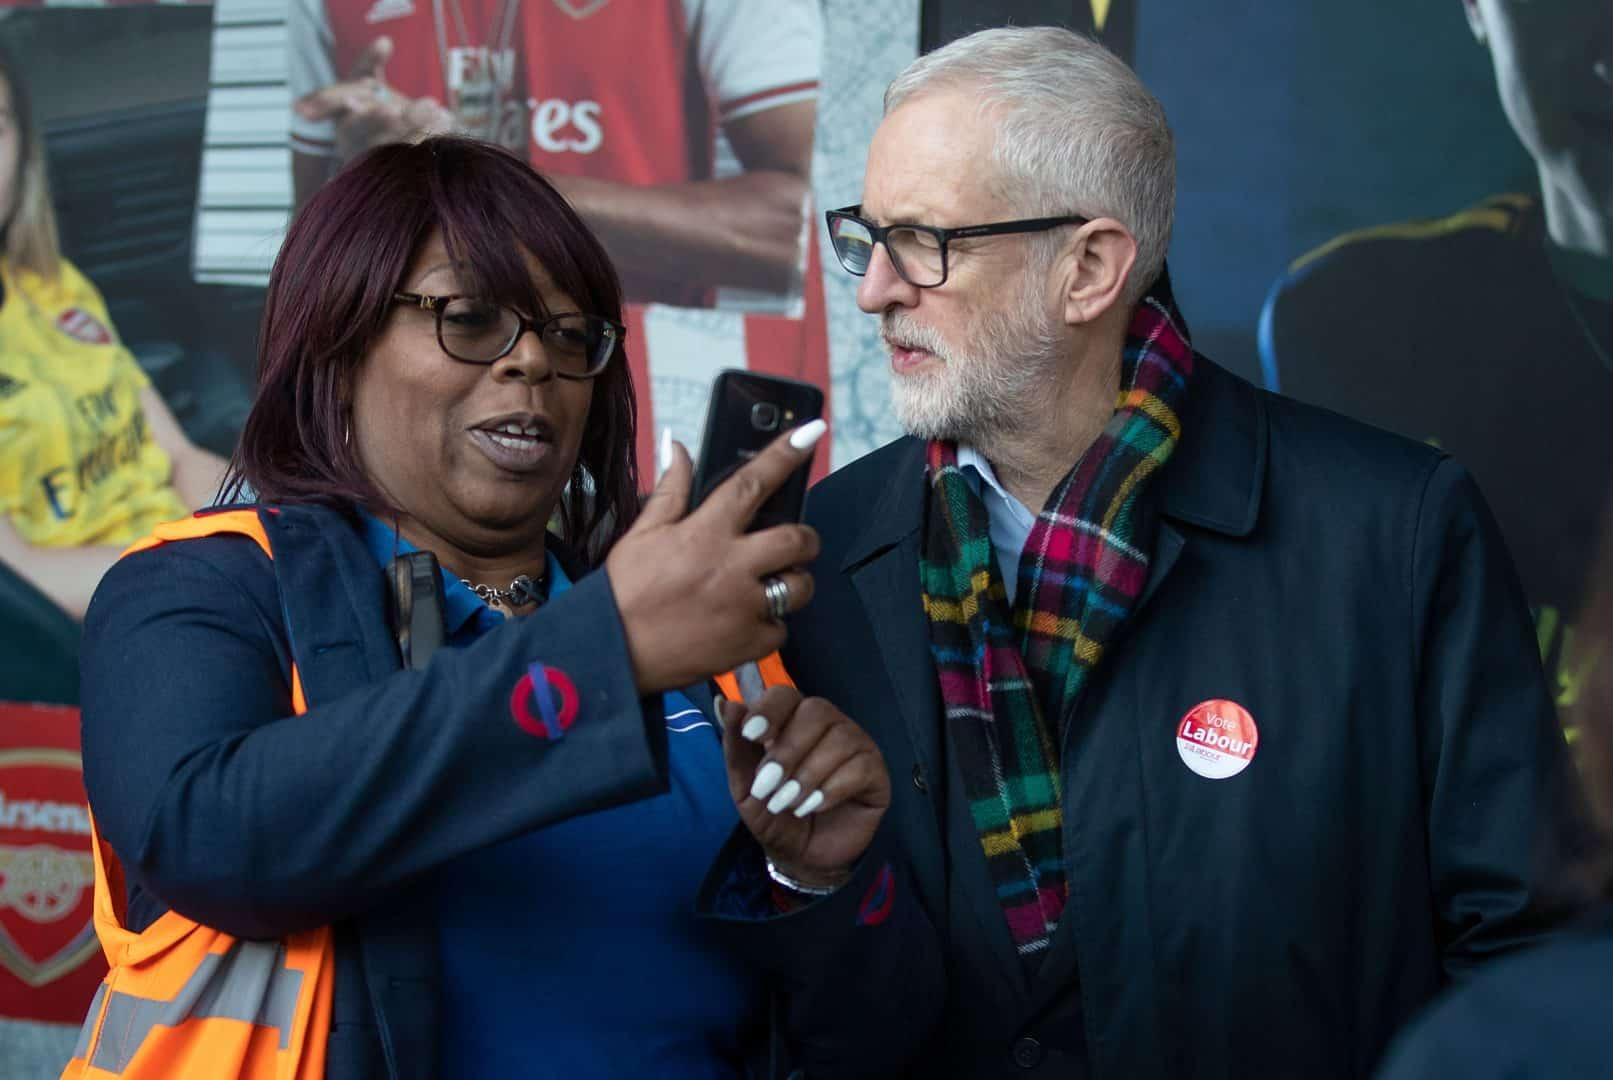 Jeremy Corbyn receives warm reception on cold morning at Finsbury Park Station (PA)